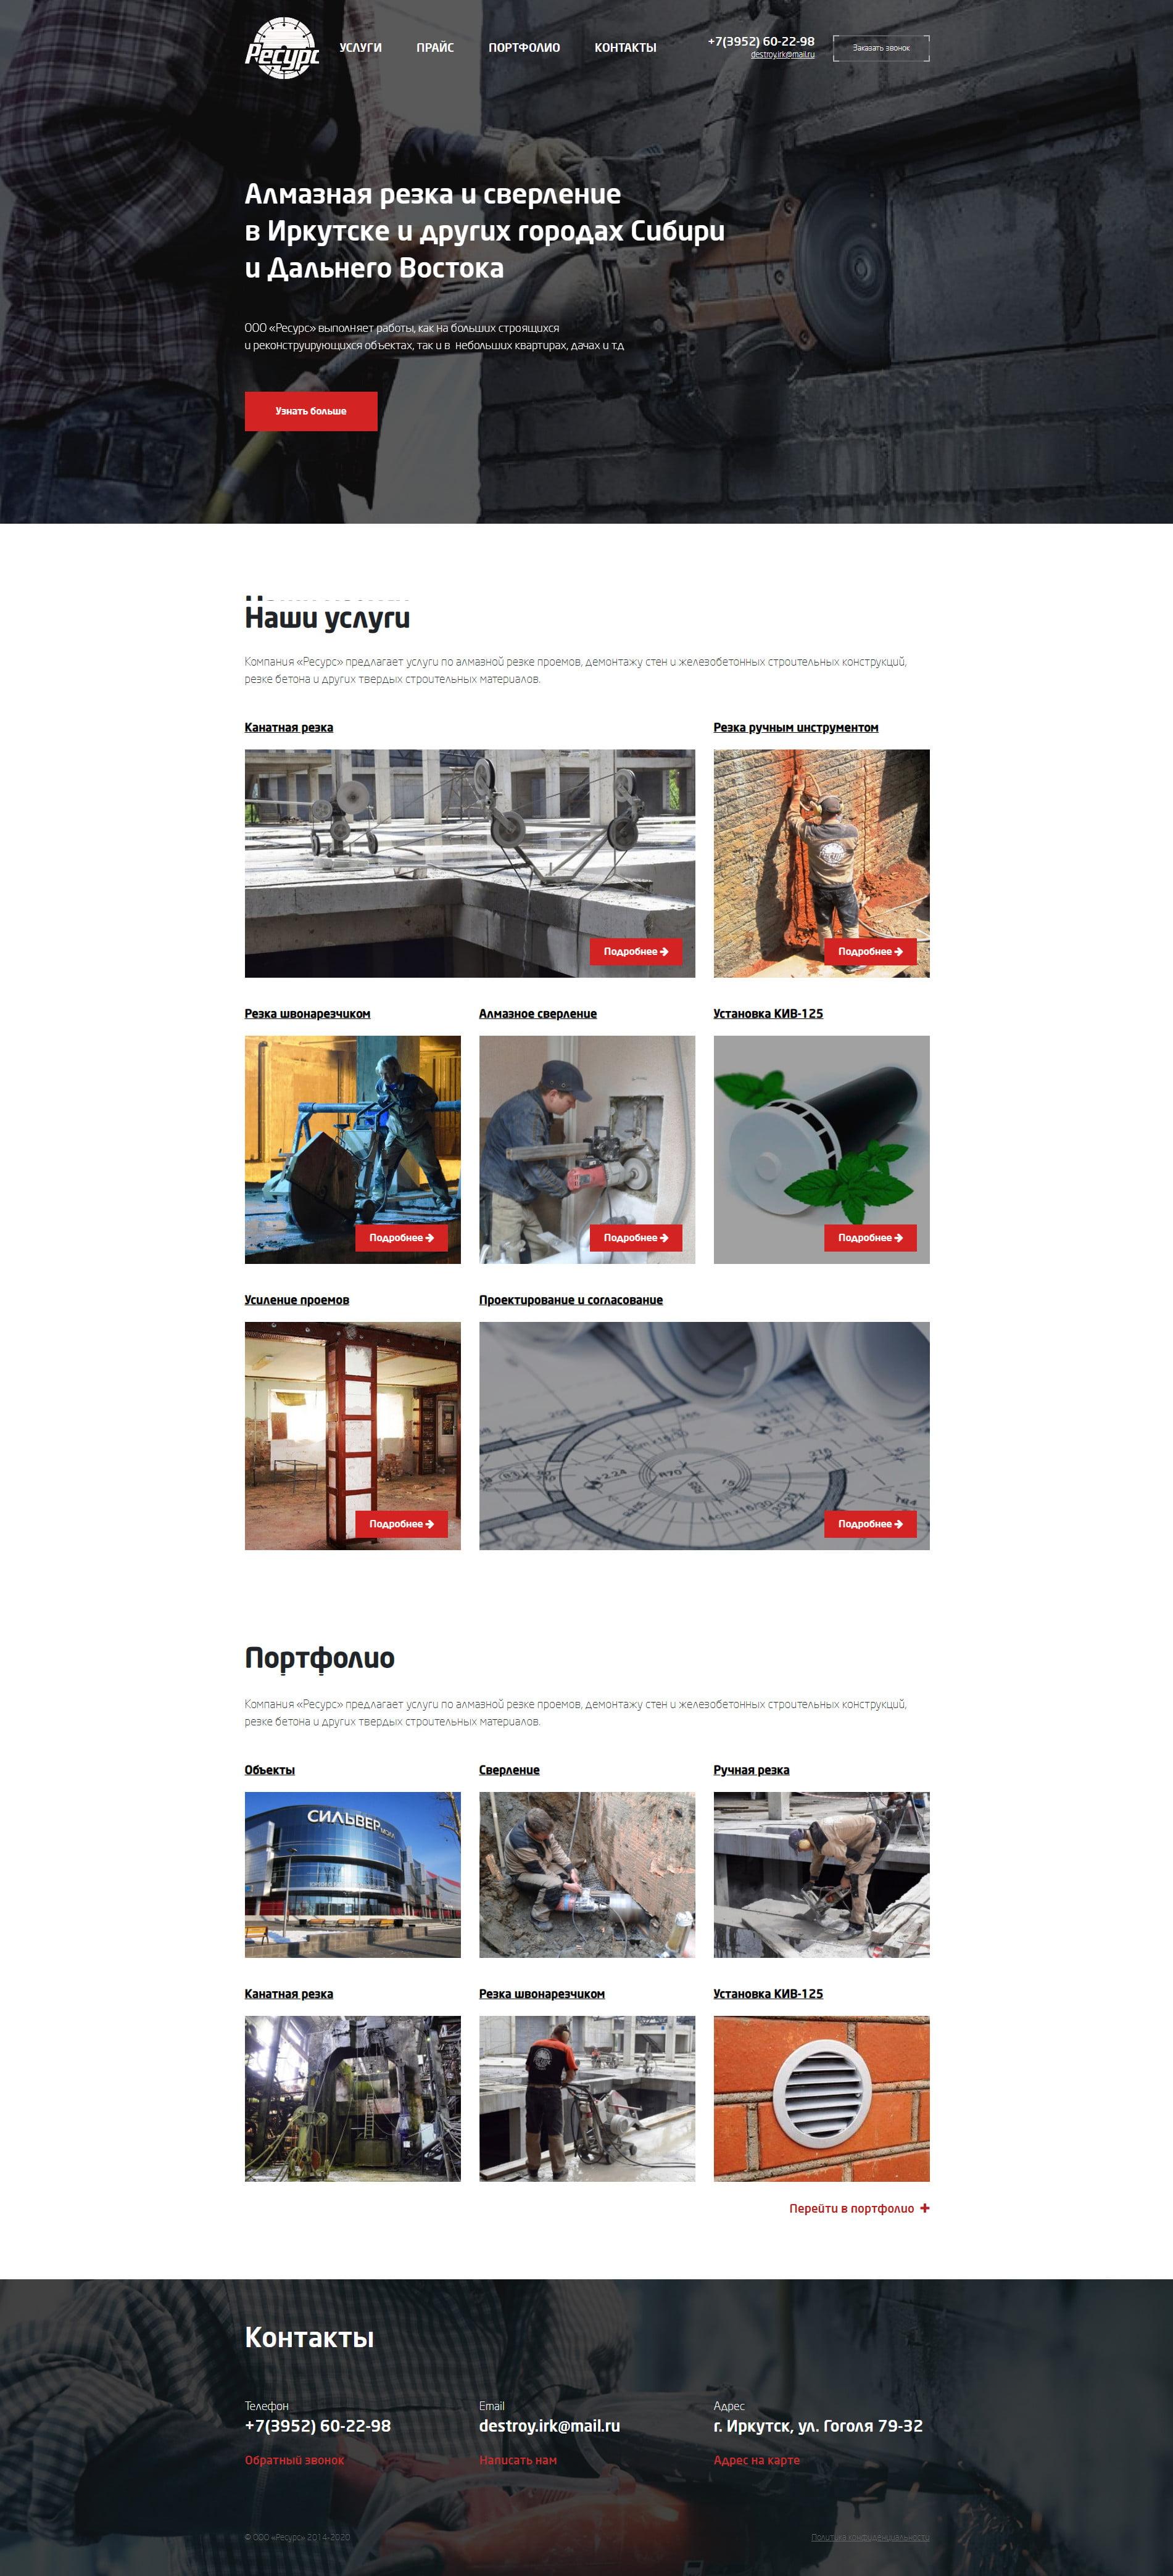 resurs-irk.ru